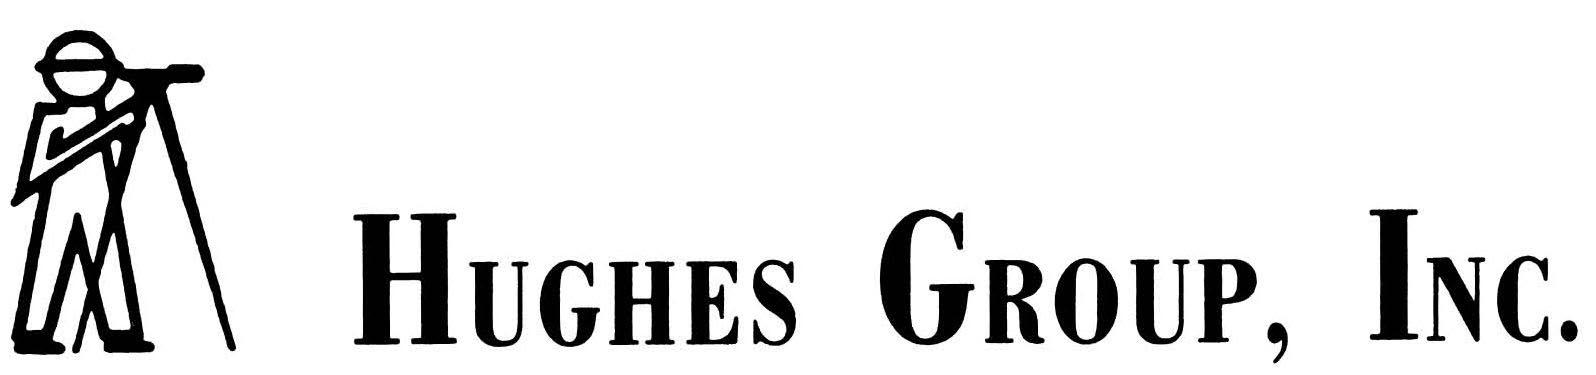 Hughes Group, Inc.